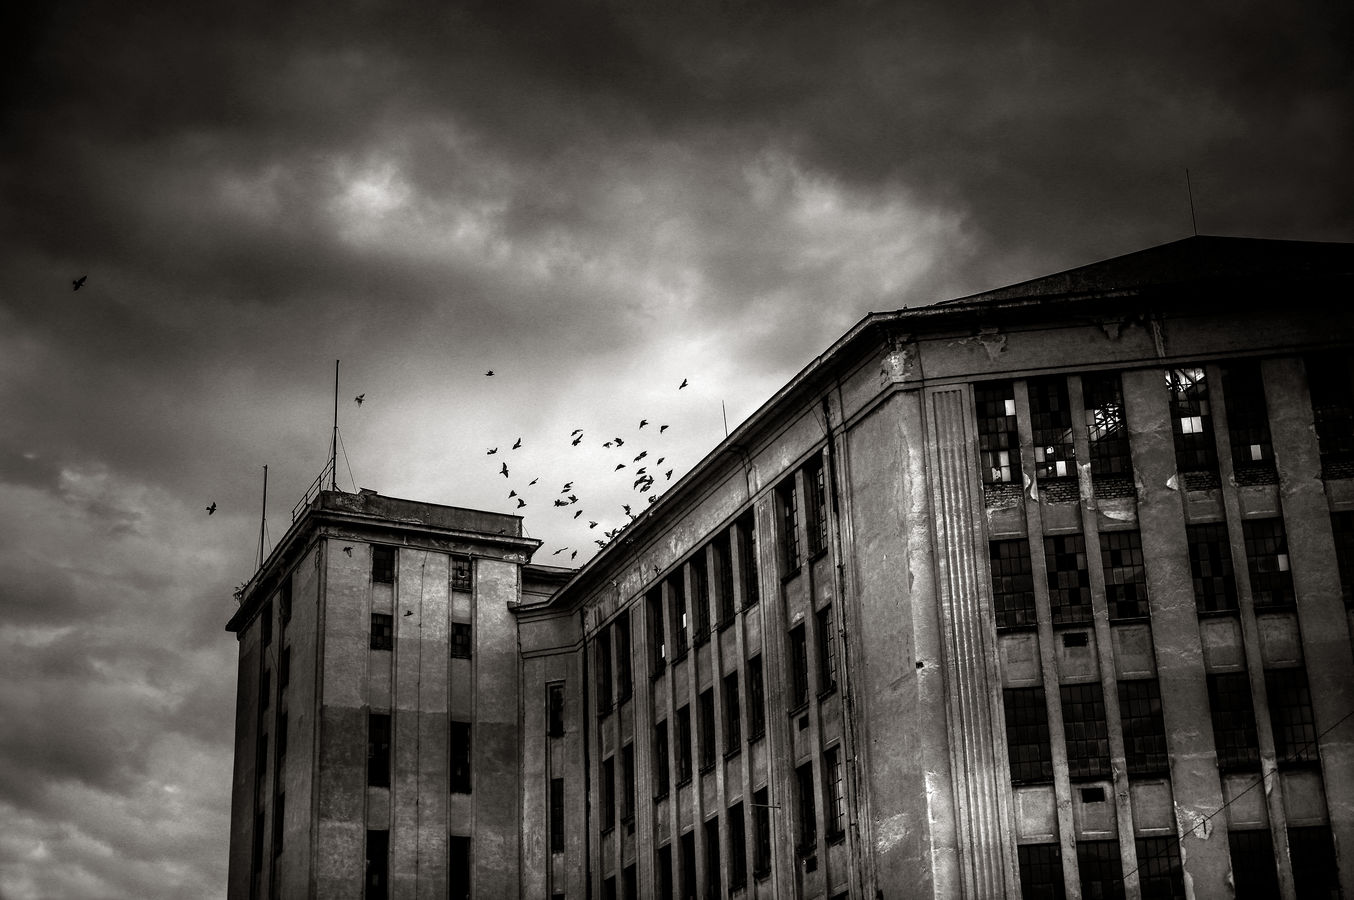 Dnes slouží holubům...